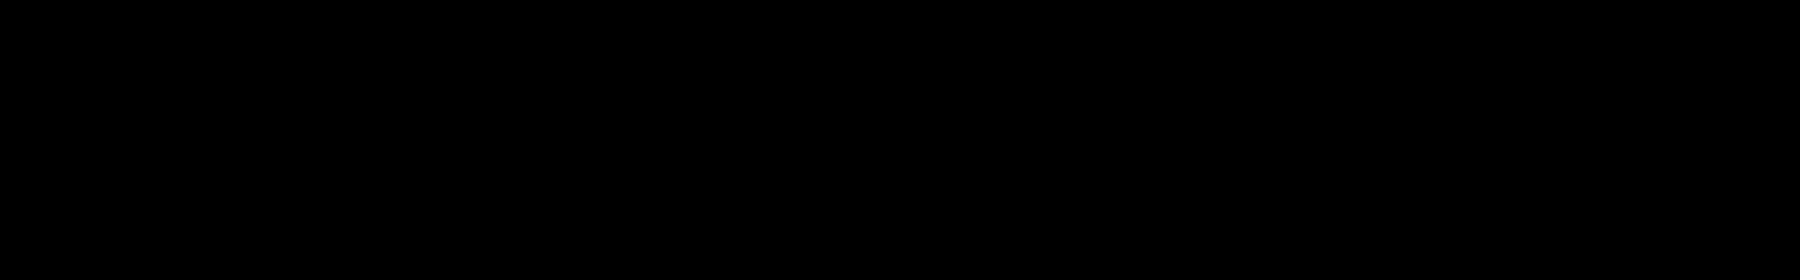 DECEMBER TRAP audio waveform